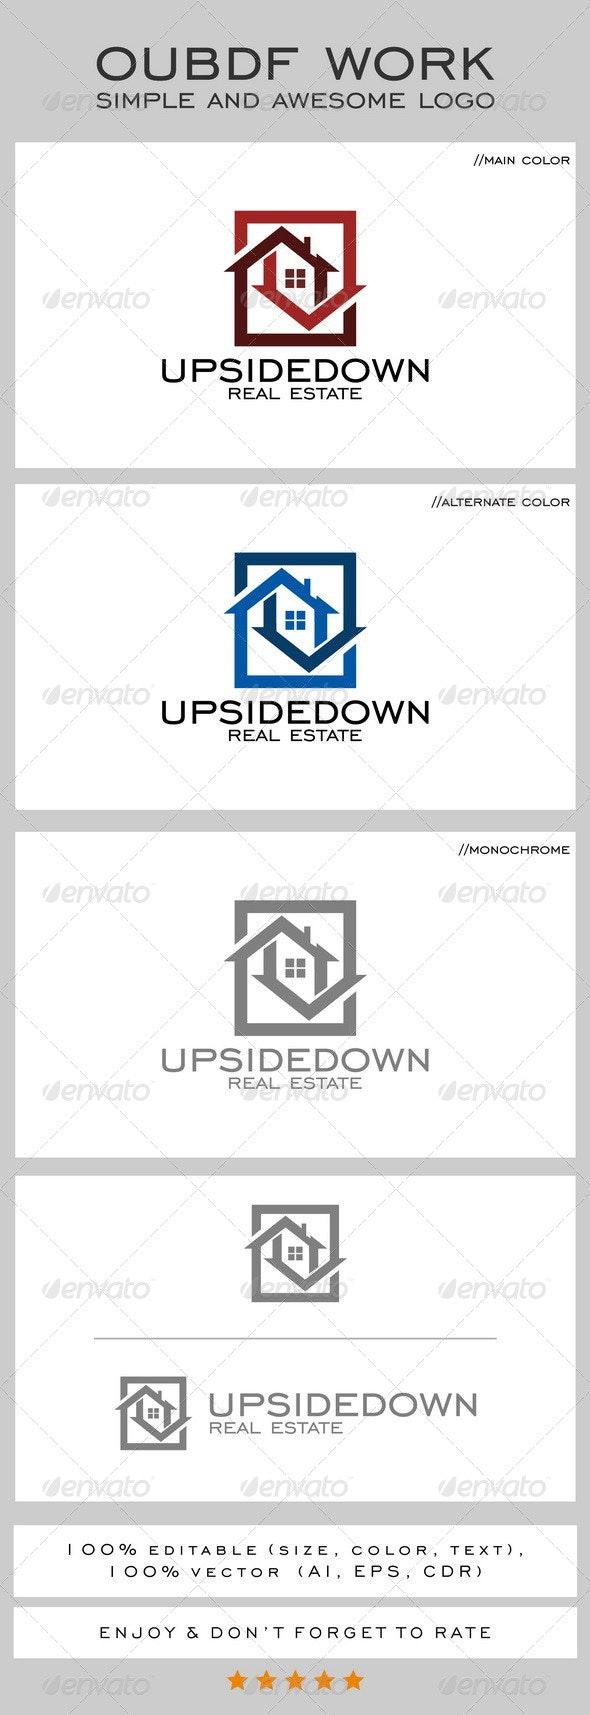 Upsidedown Real Estate Logo - Buildings Logo Templates